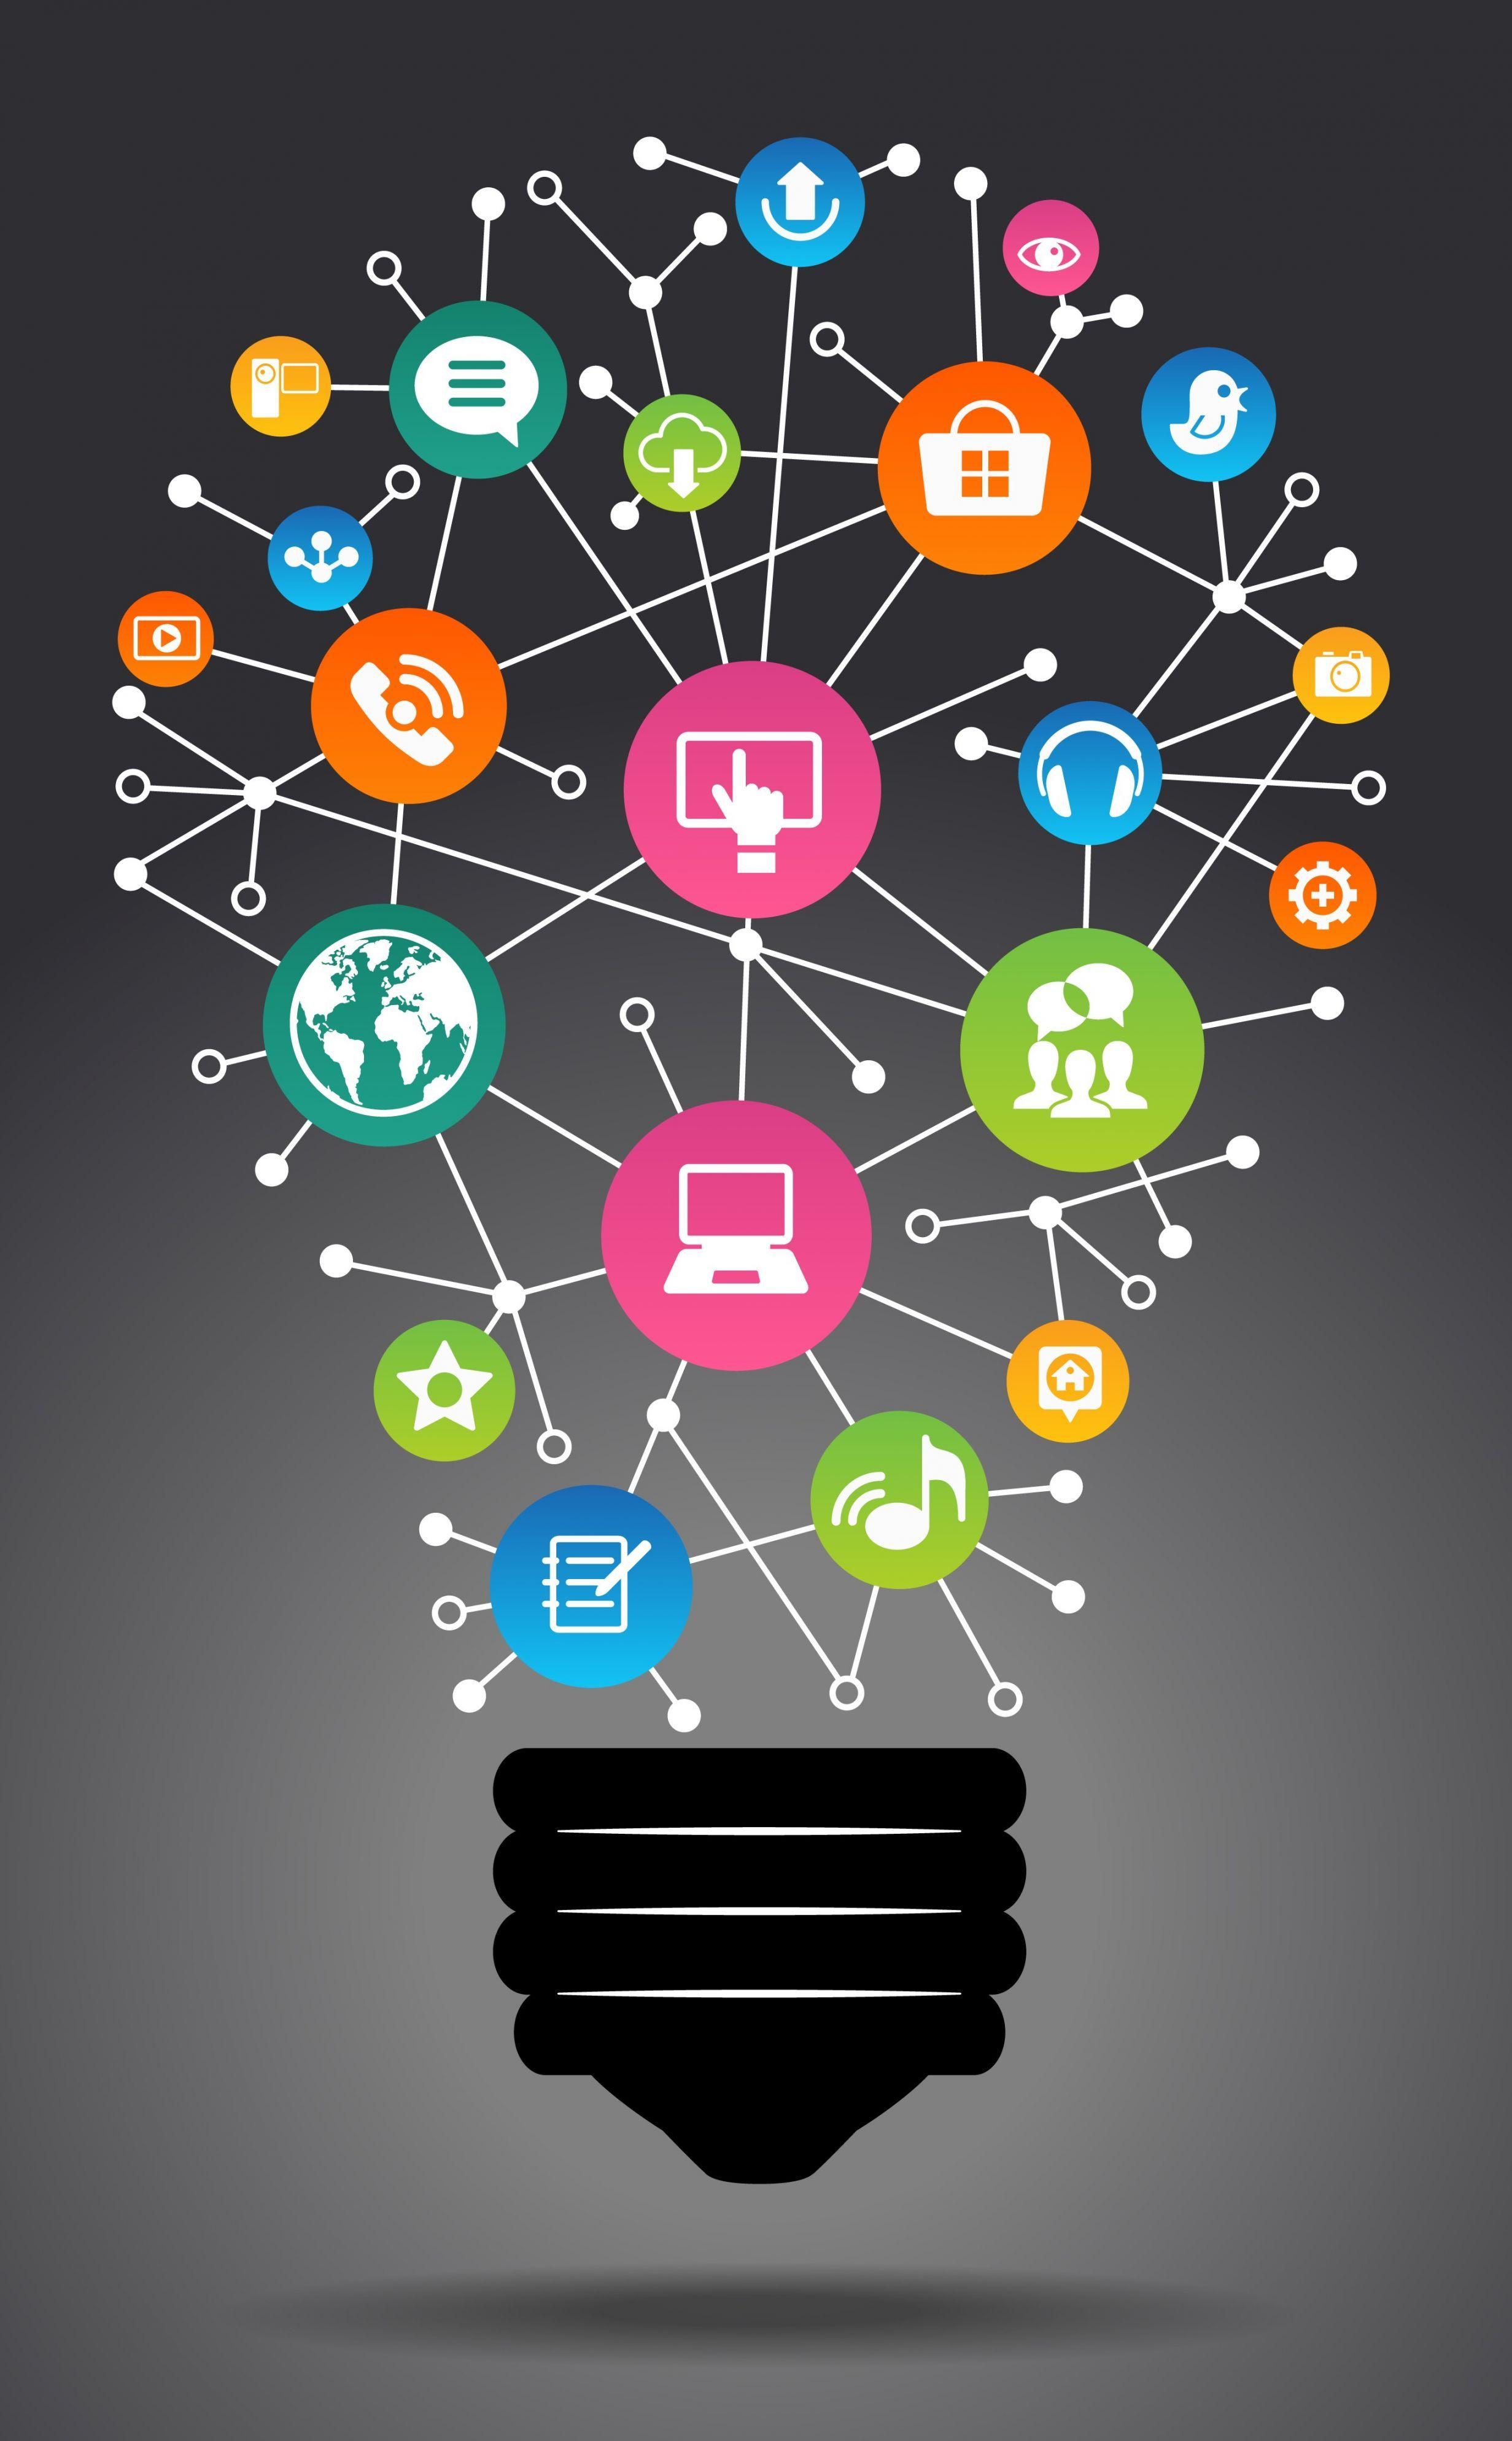 3 Day Digital Marketing Social Media For Business Course Digital Marketing Digital Marketing Company Web Design Company